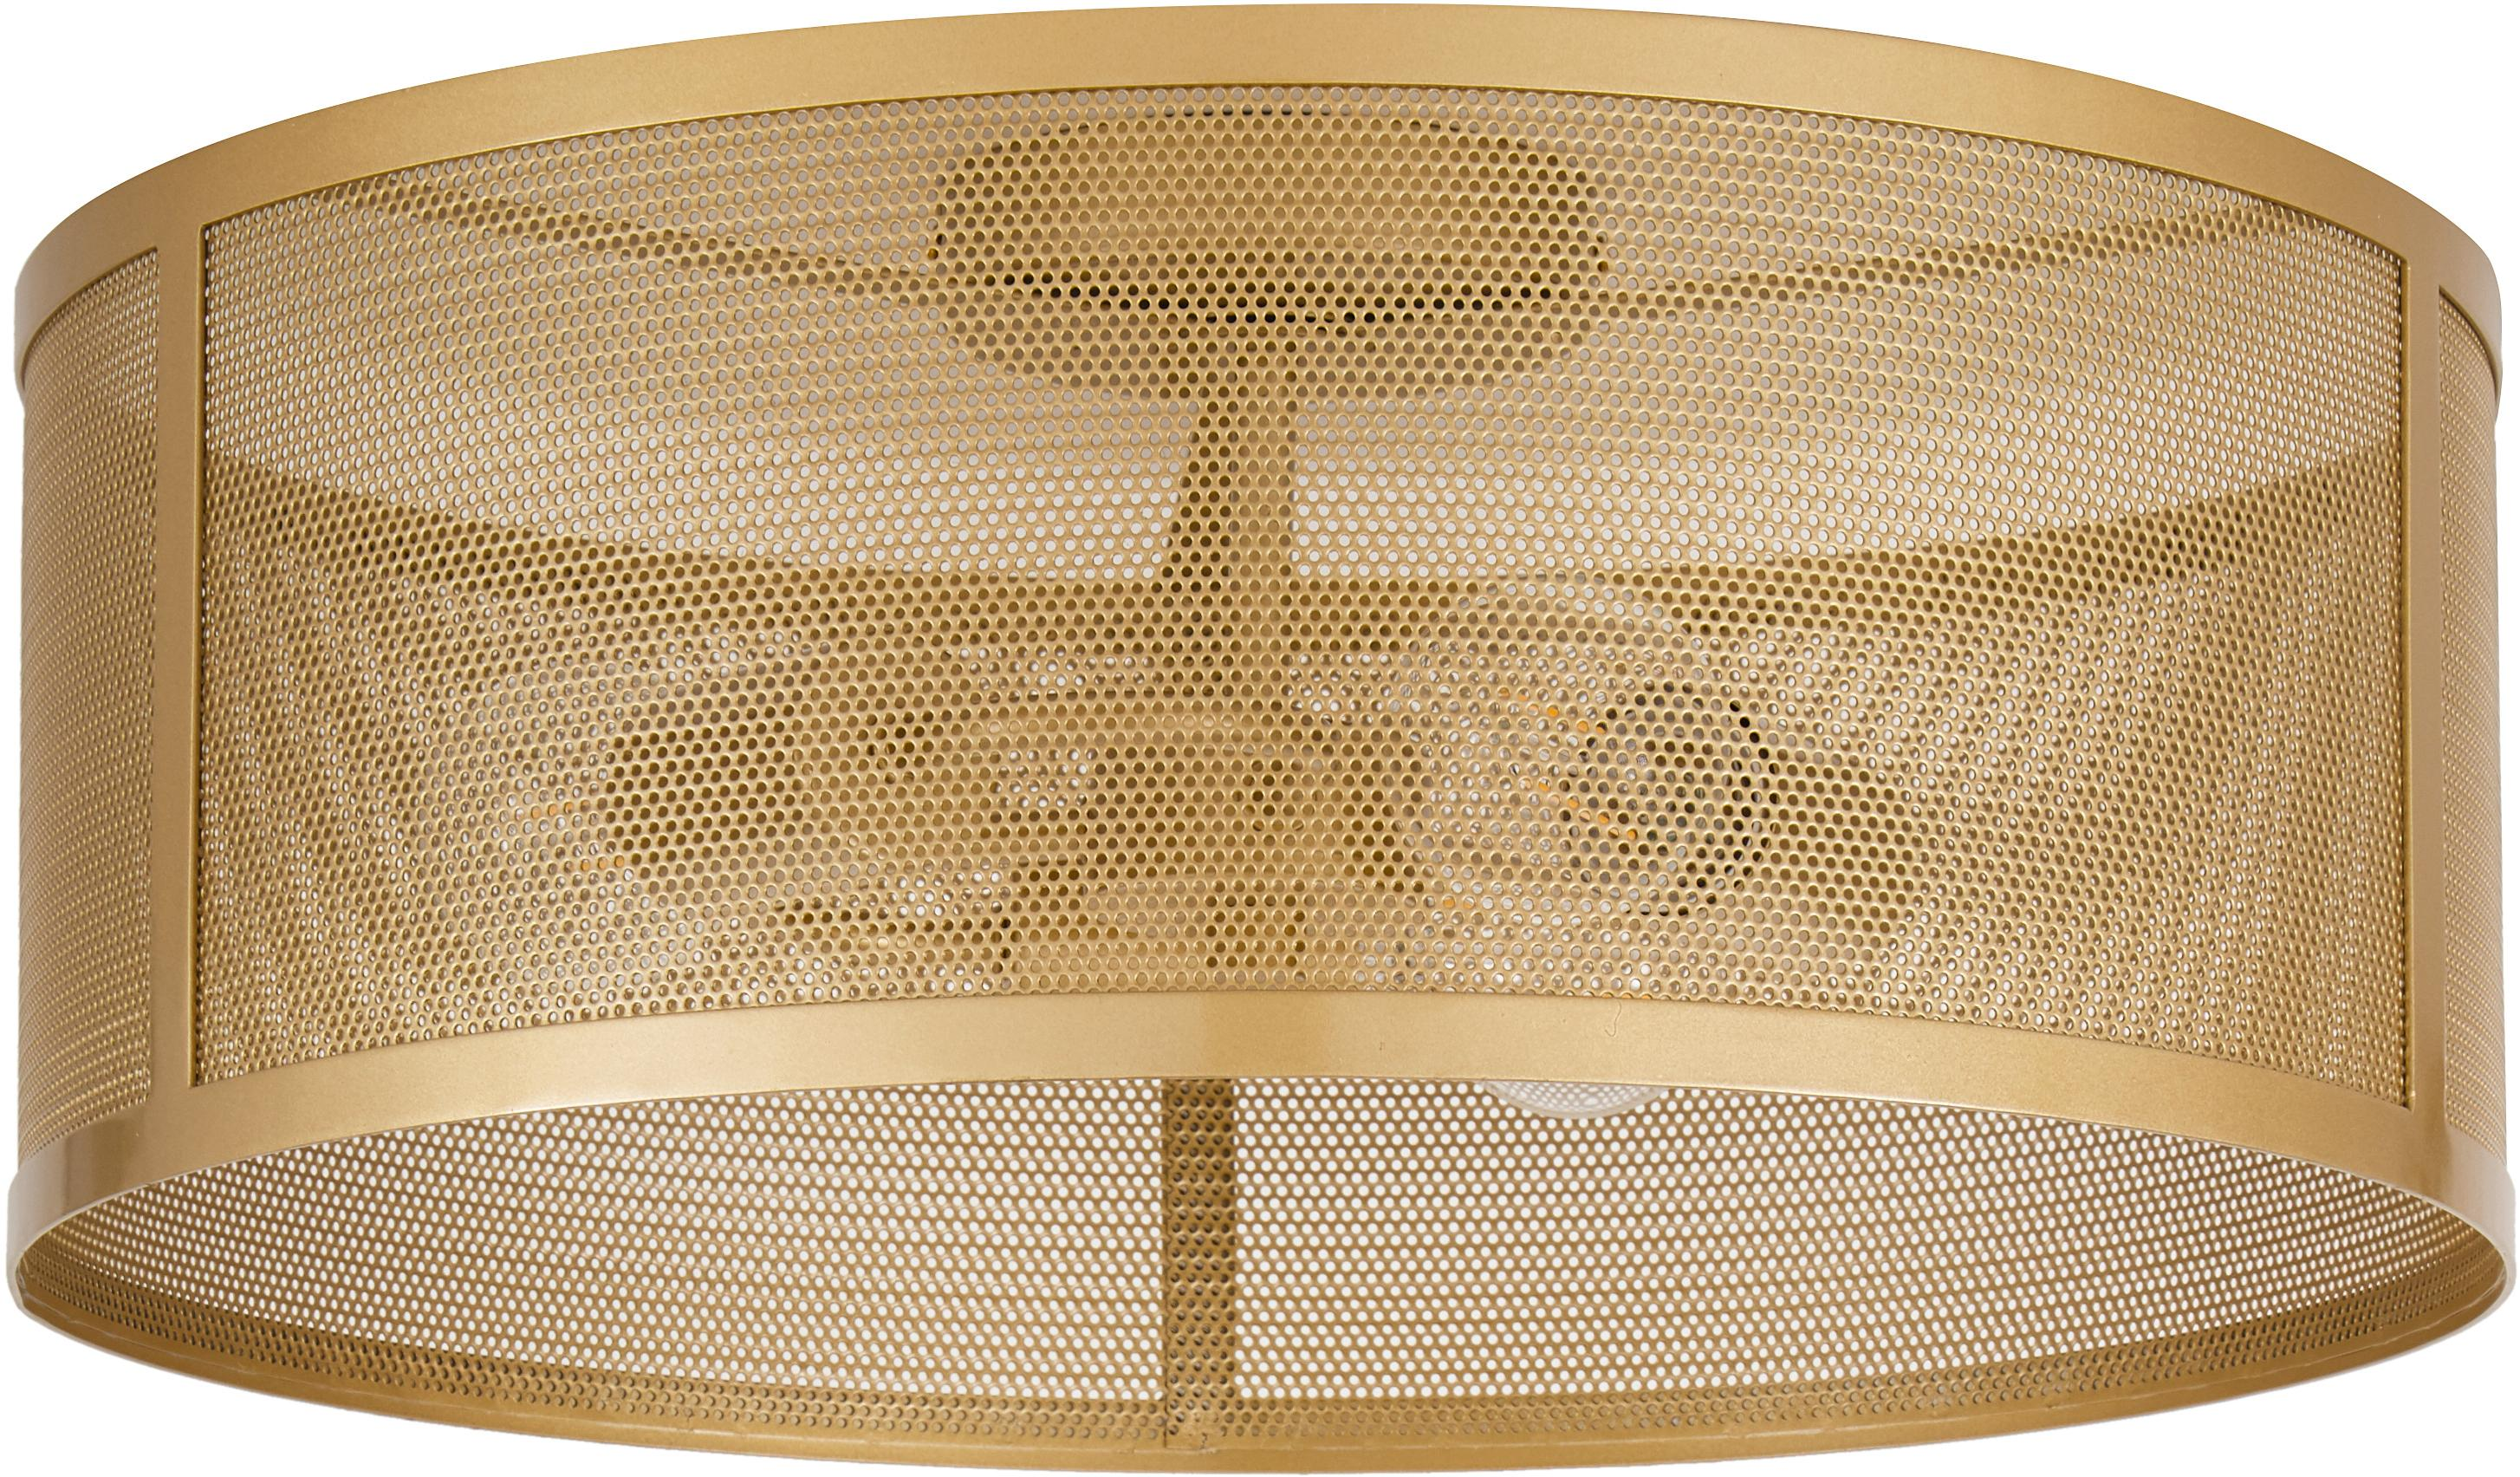 Plafoniera Fishnet, Metallo rivestito, Dorato, Ø 45 x Alt. 21 cm